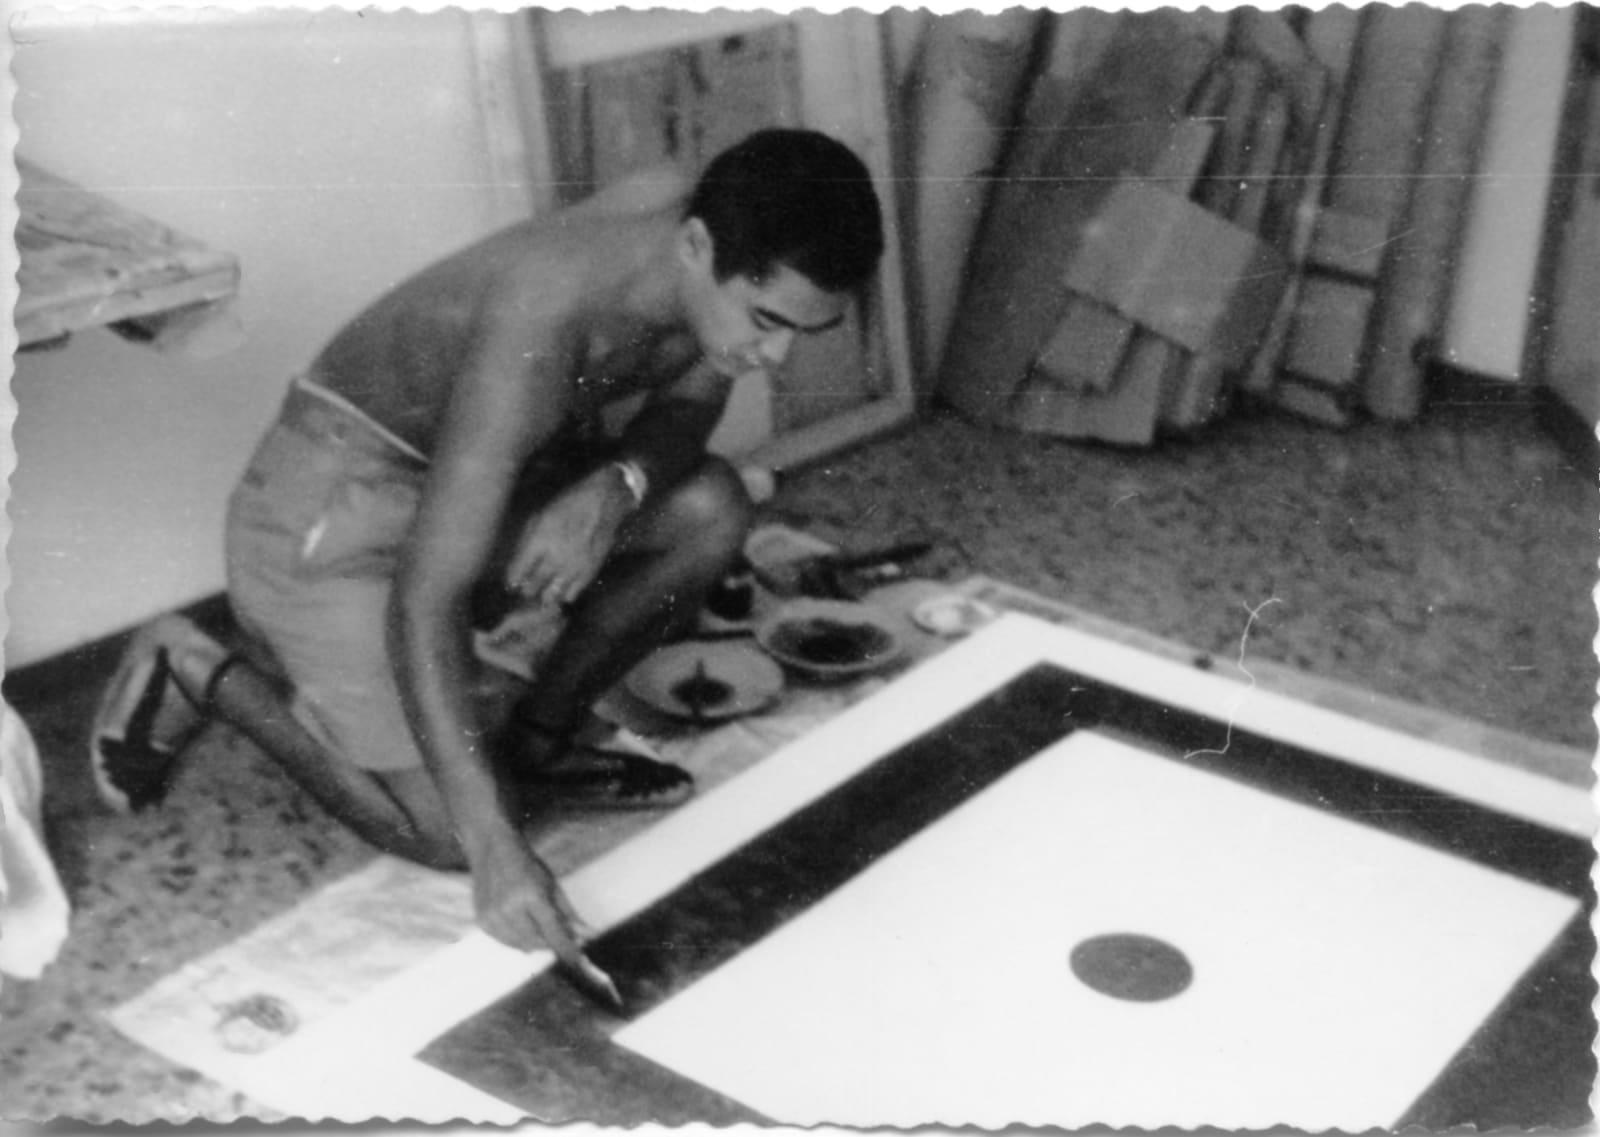 1962, Hsiao Chin in his studio 1962年蕭勤在個人工作室作畫